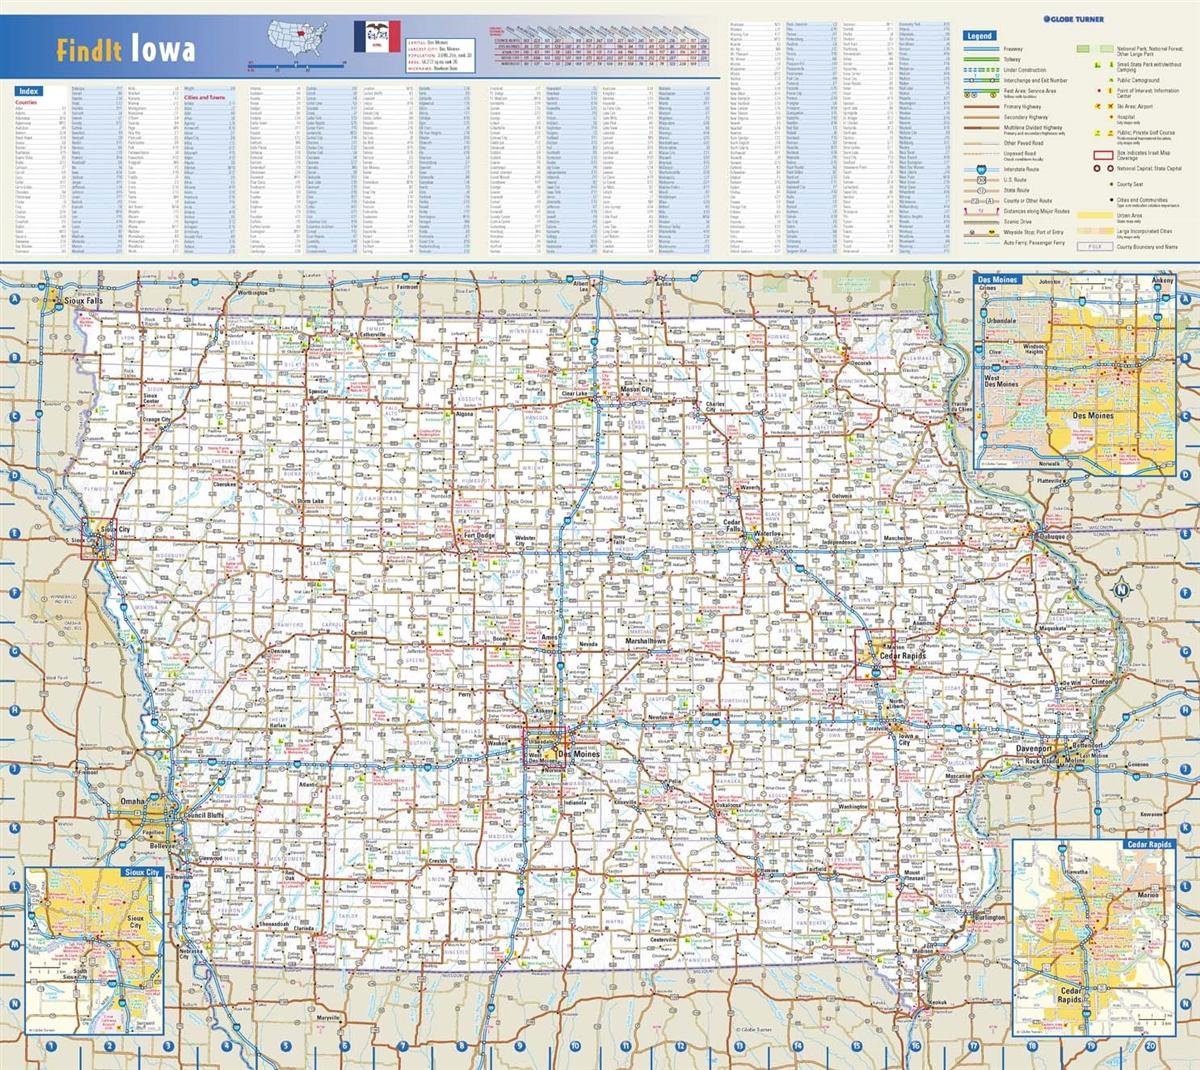 Iowa State Wall Map by Globe Turner 42 x 38 on